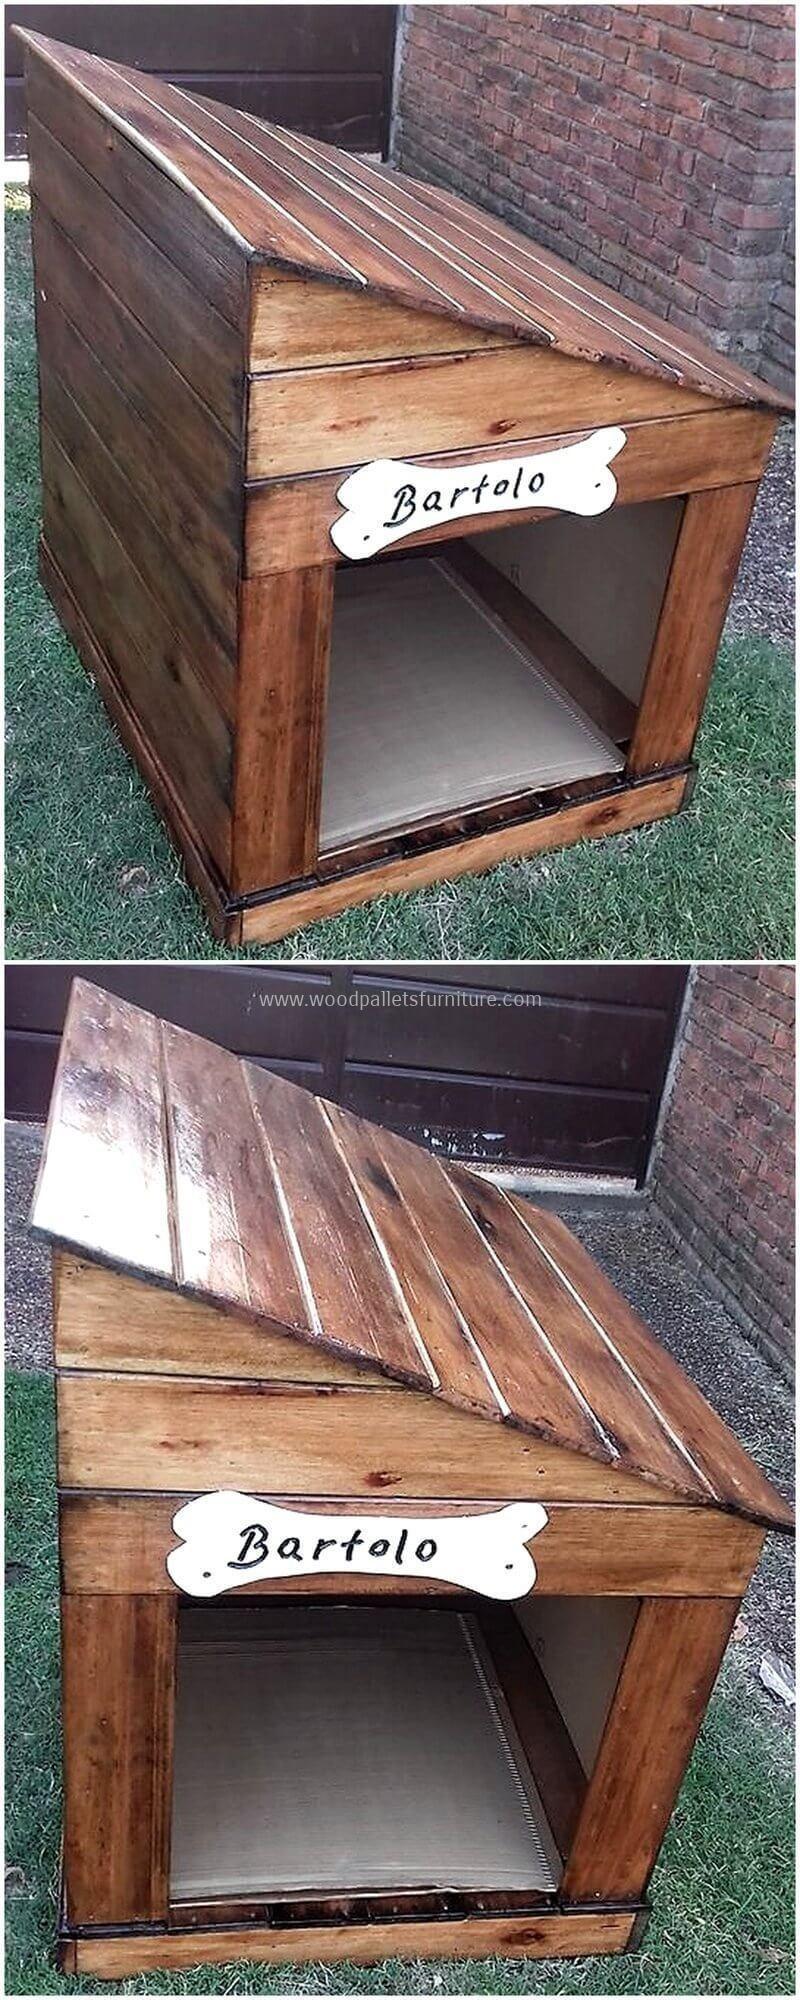 Original Diy Ideas For Wooden Pallets Recycling Pallet Dog House Dog Furniture Wooden Dog House